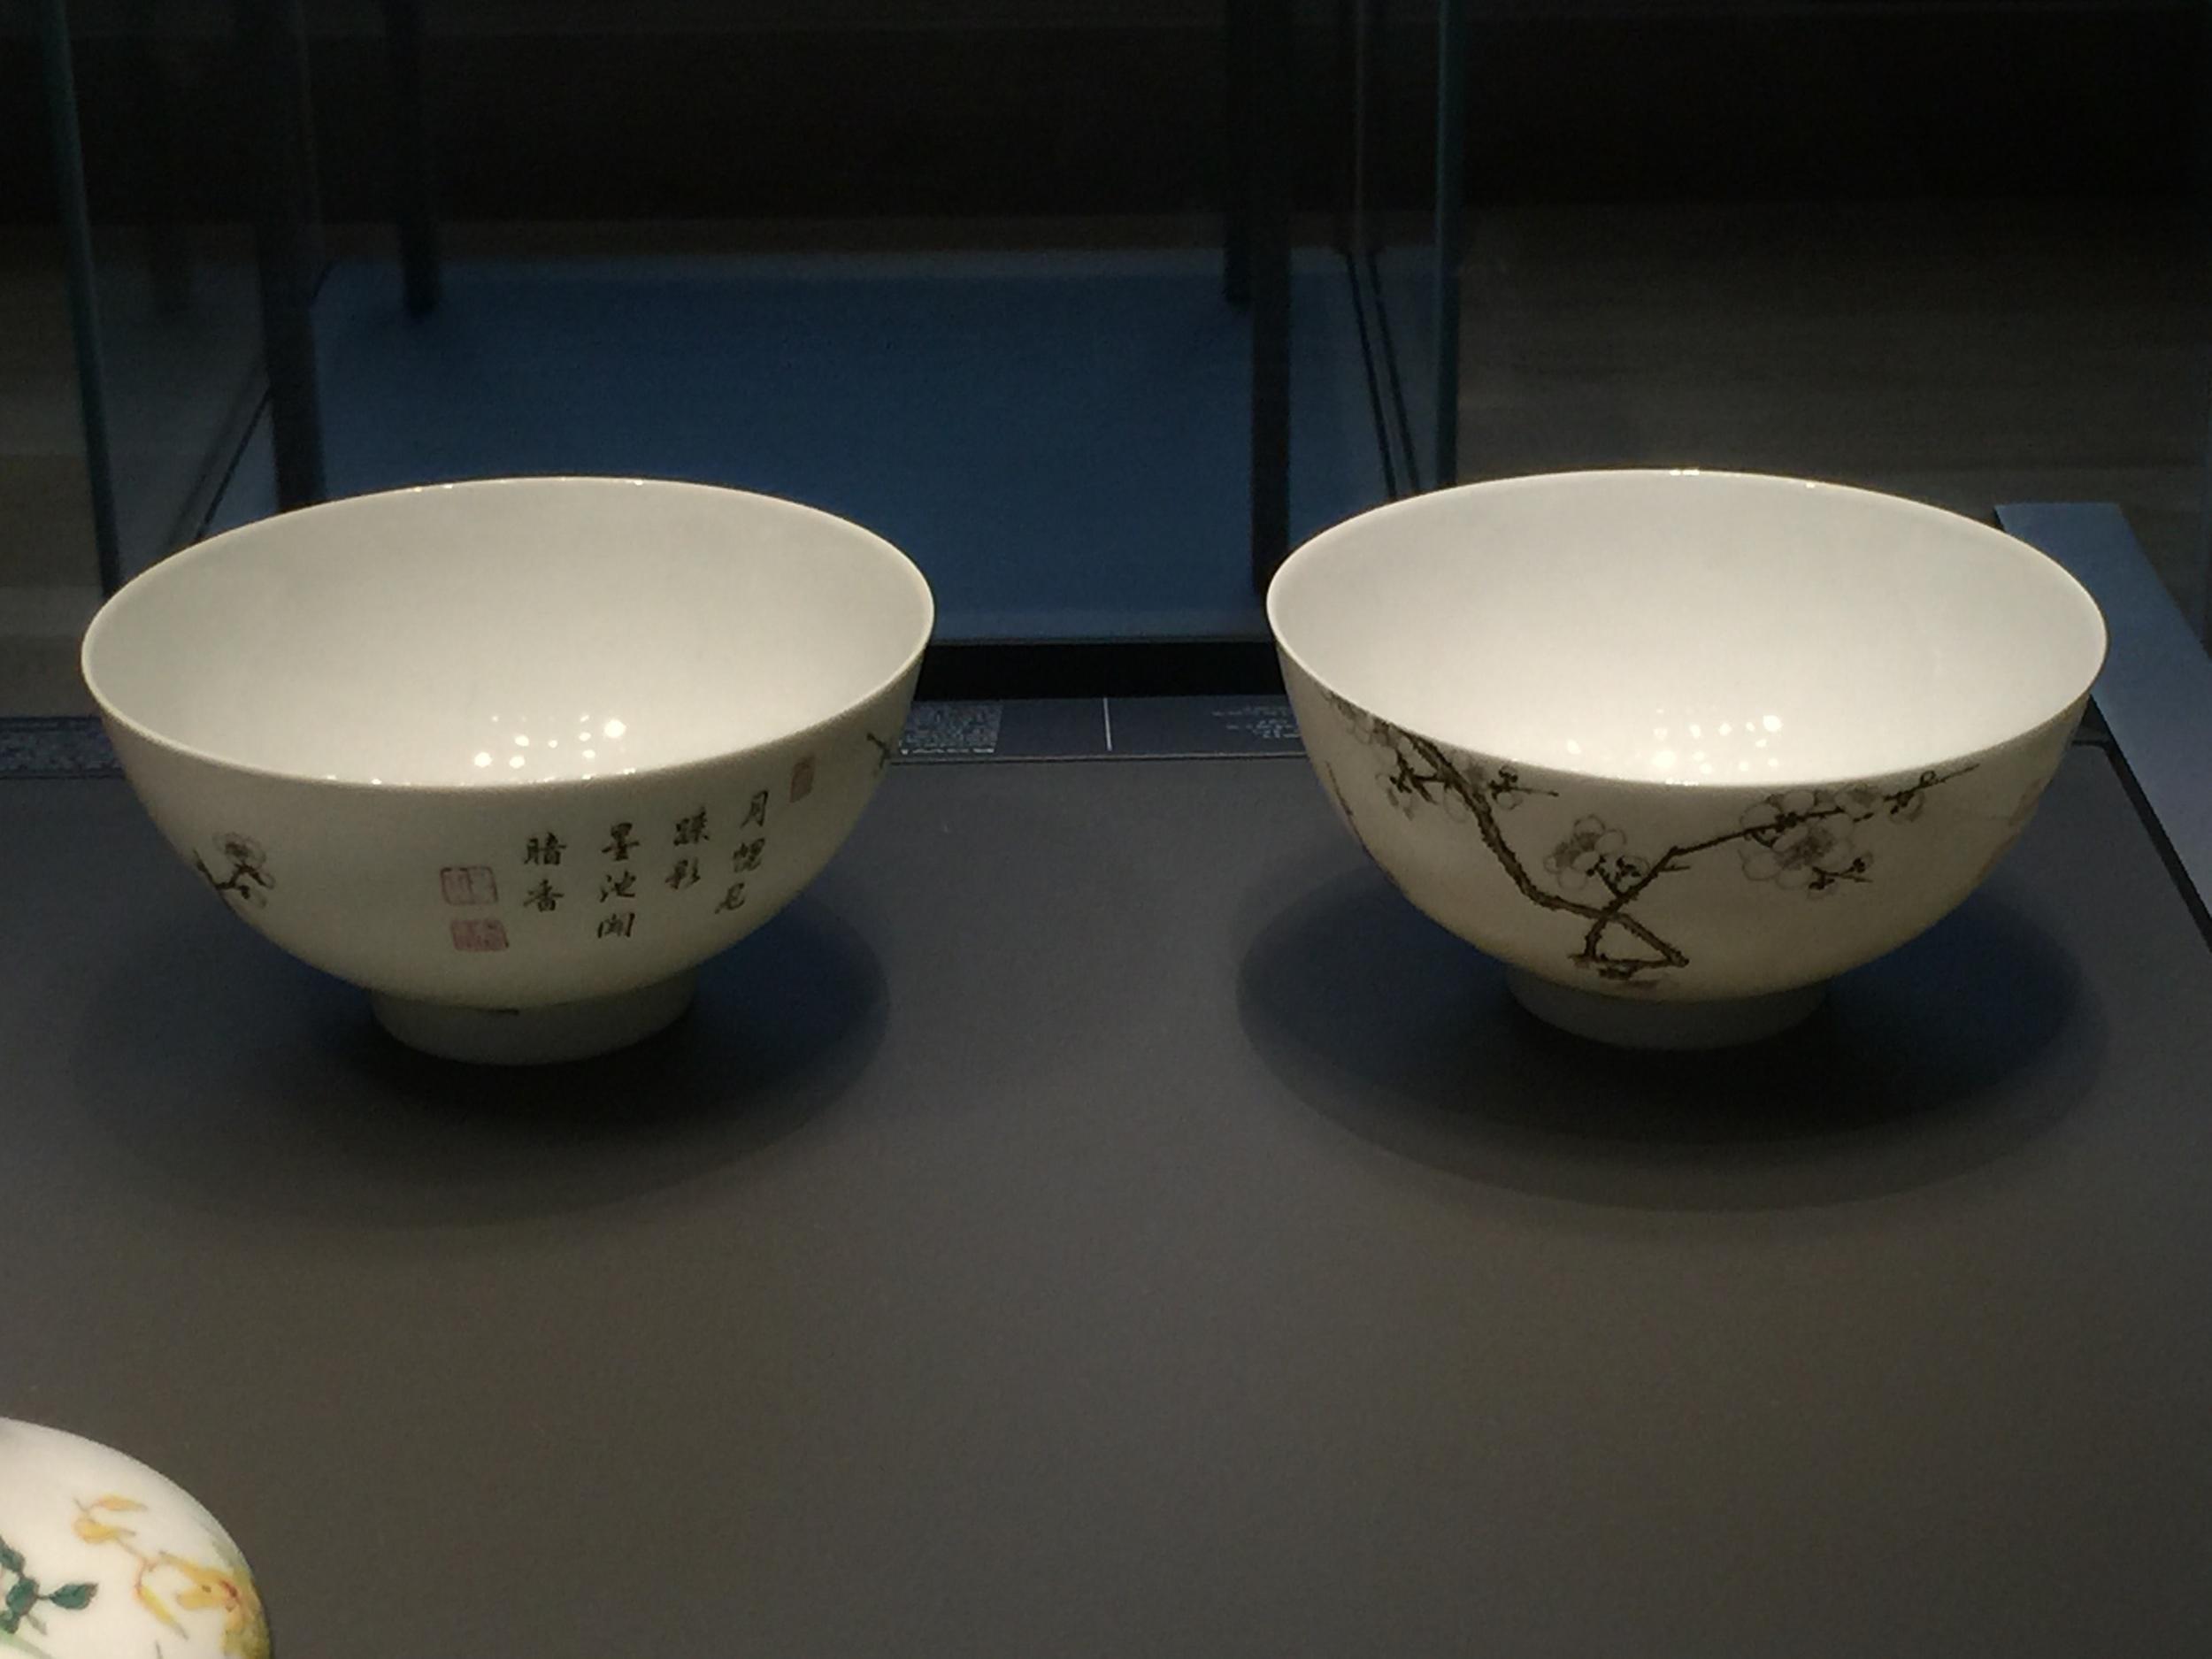 Chinese-Porcelain-British-Museum-Percival-David-jessewaugh.com-85.jpg